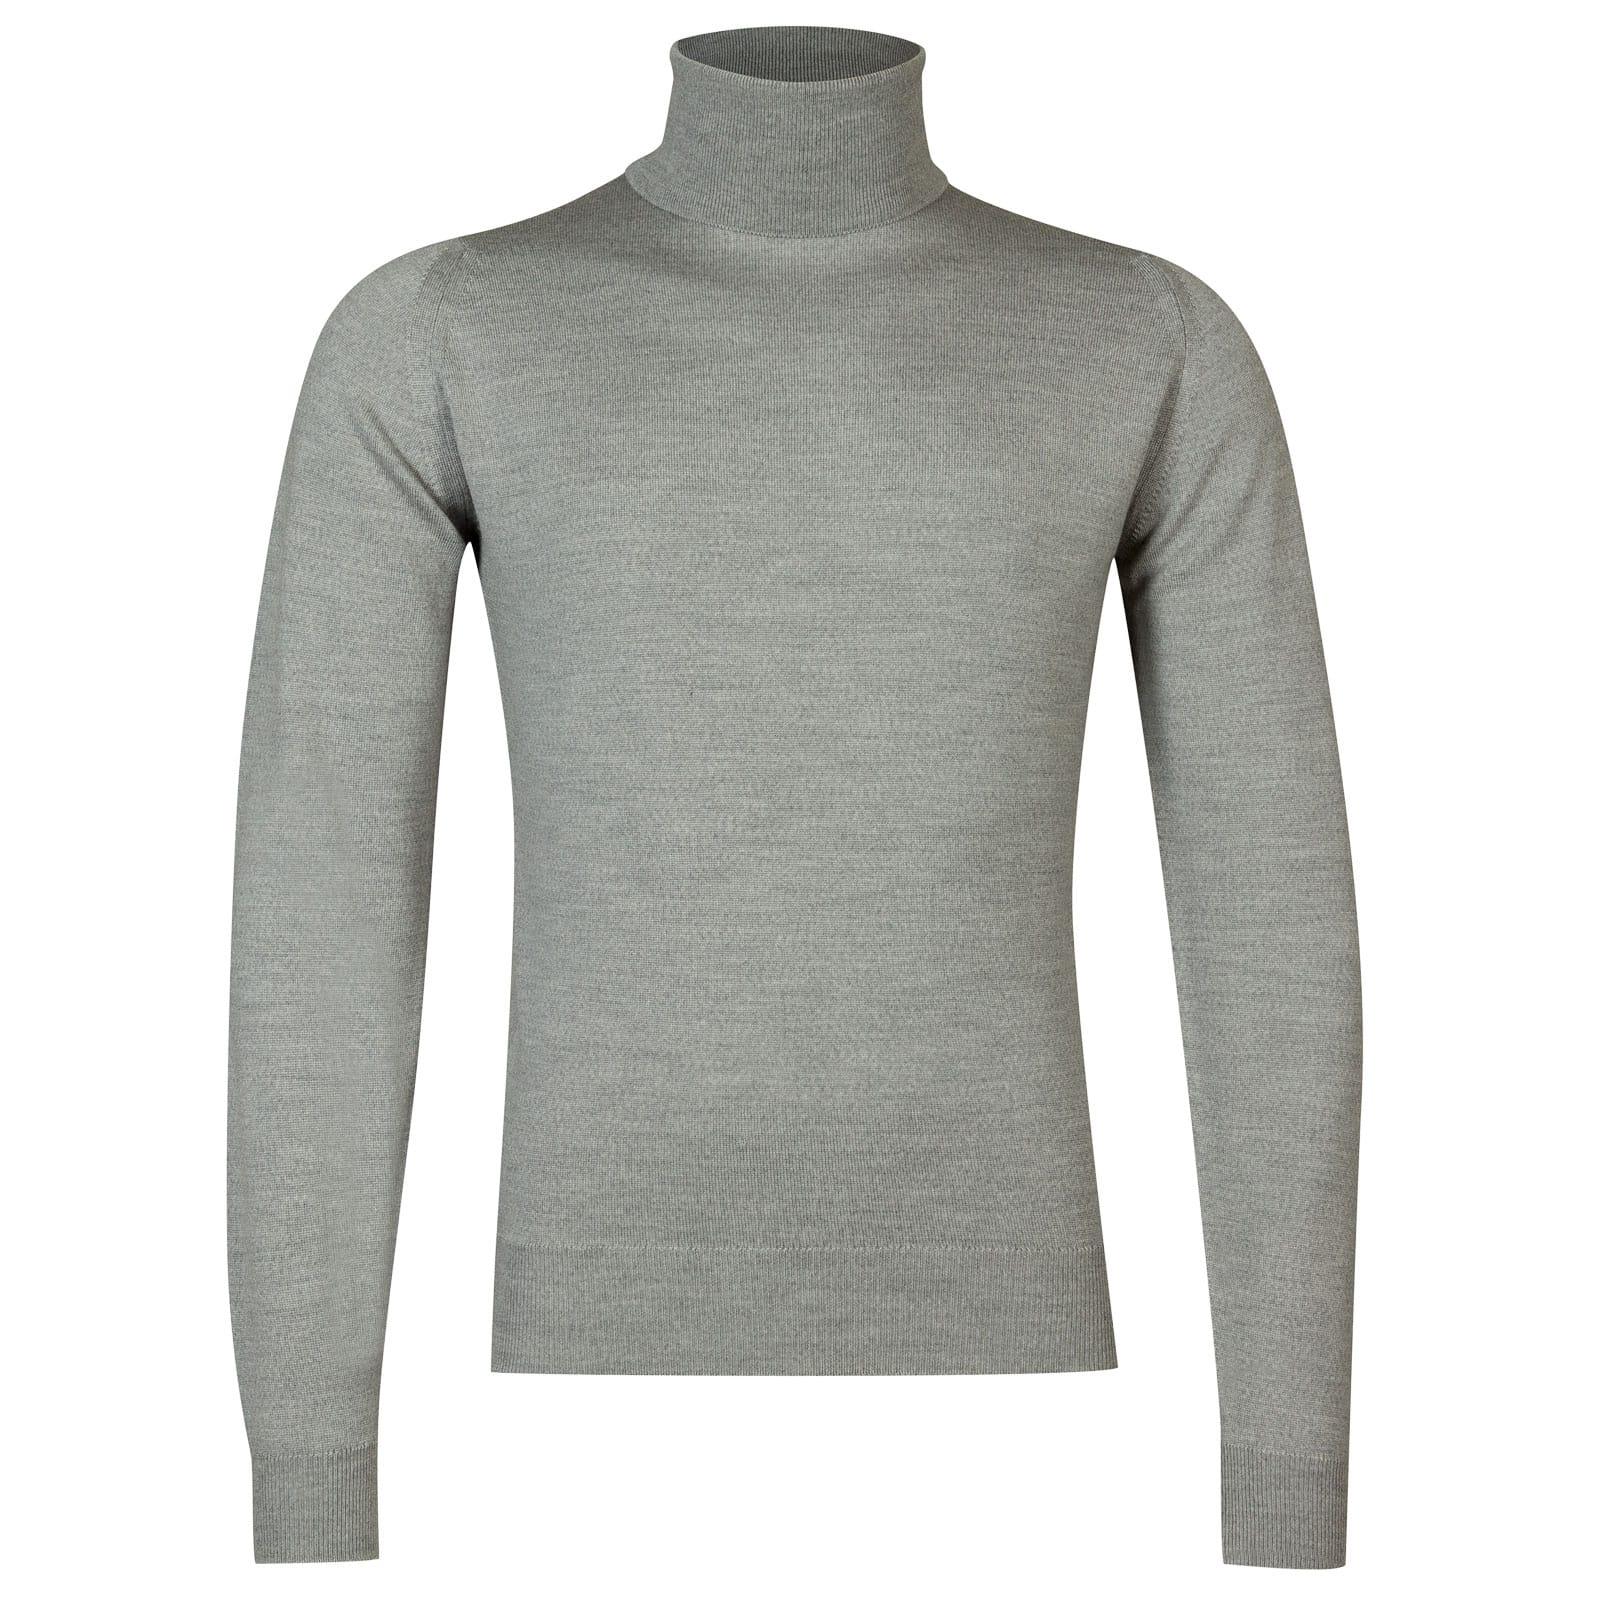 John Smedley connell Merino Wool Pullover in Bardot Grey-S